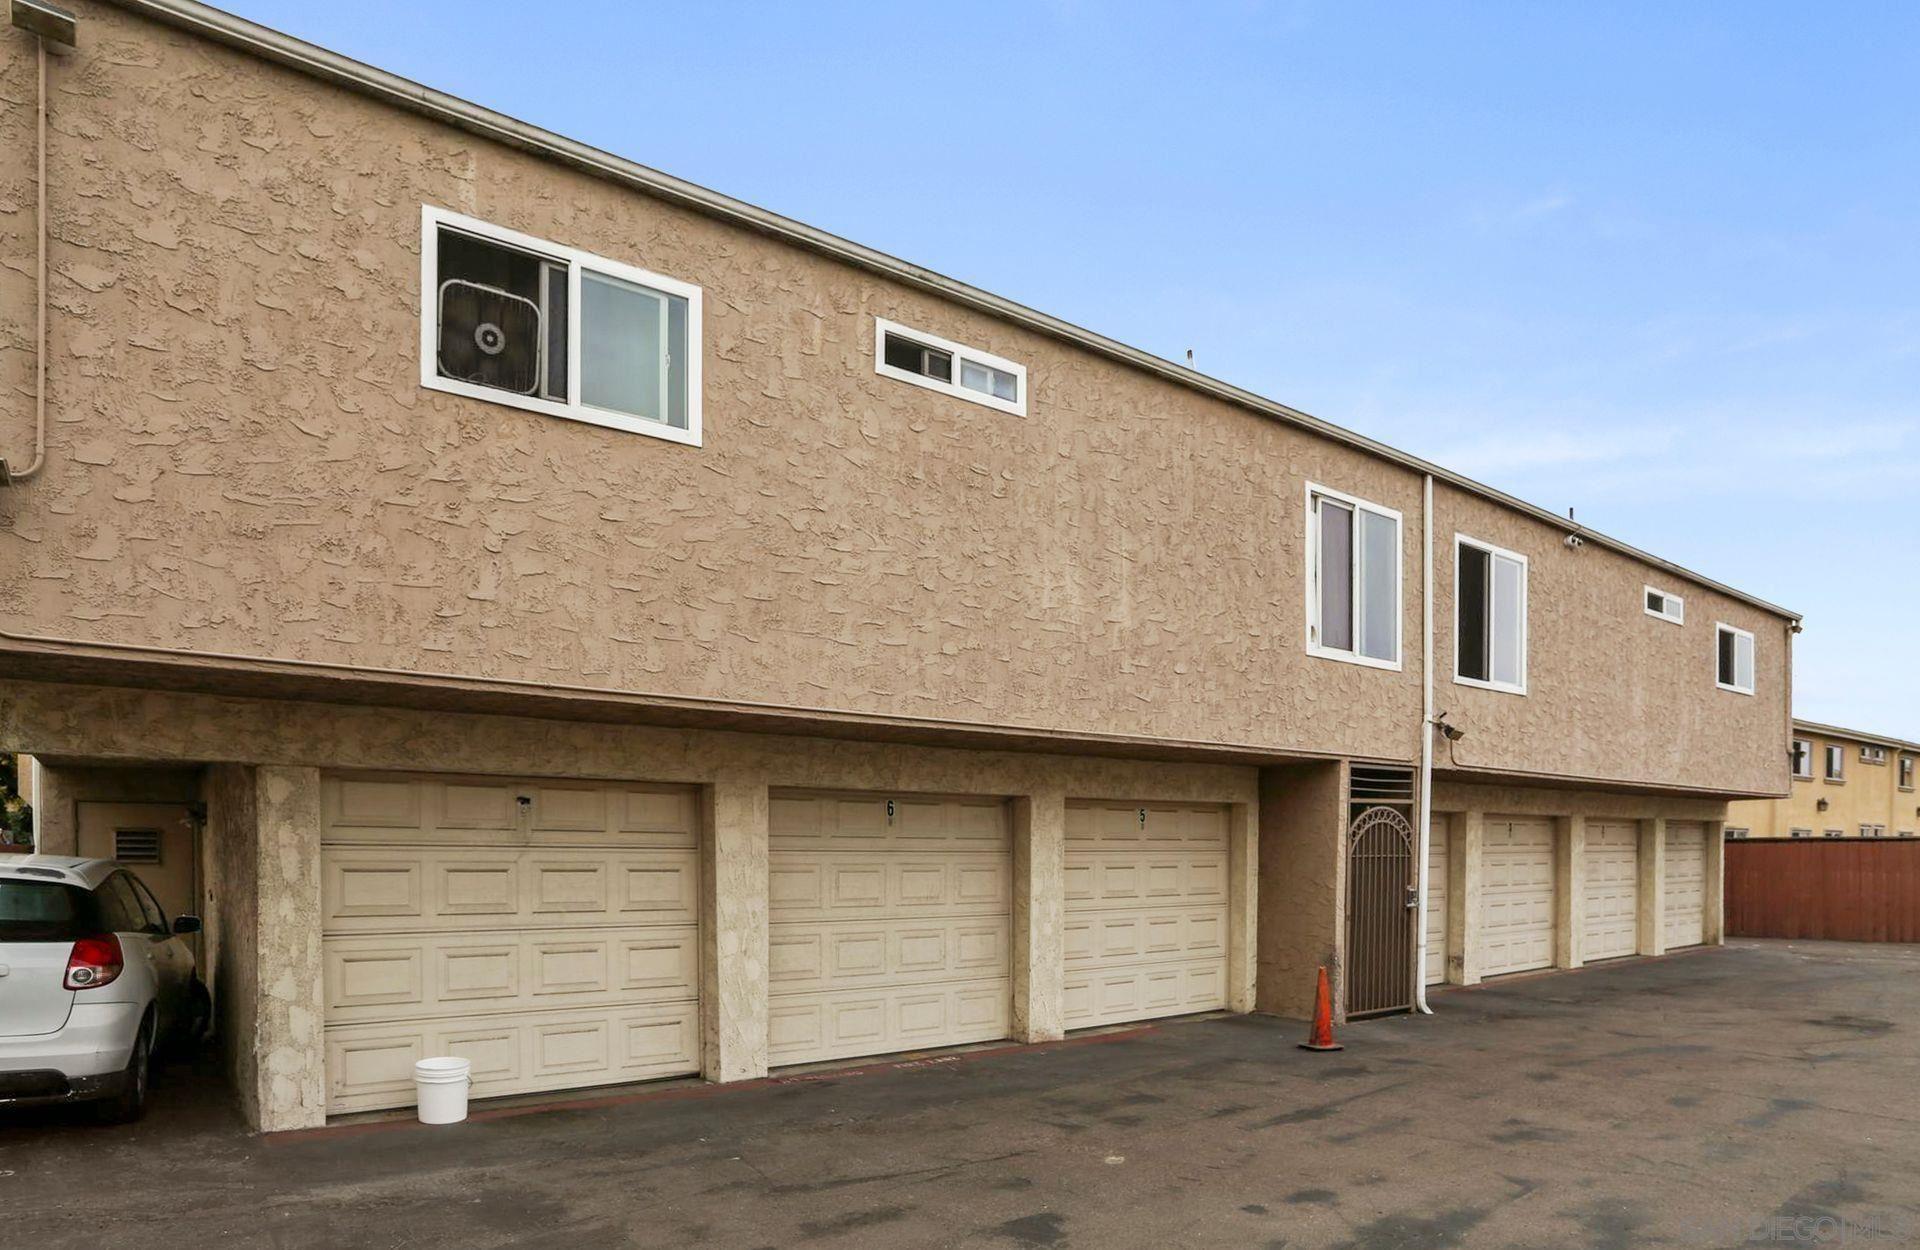 Photo of 1472 Iris Ave #17, Imperial Beach, CA 91932 (MLS # 210026438)